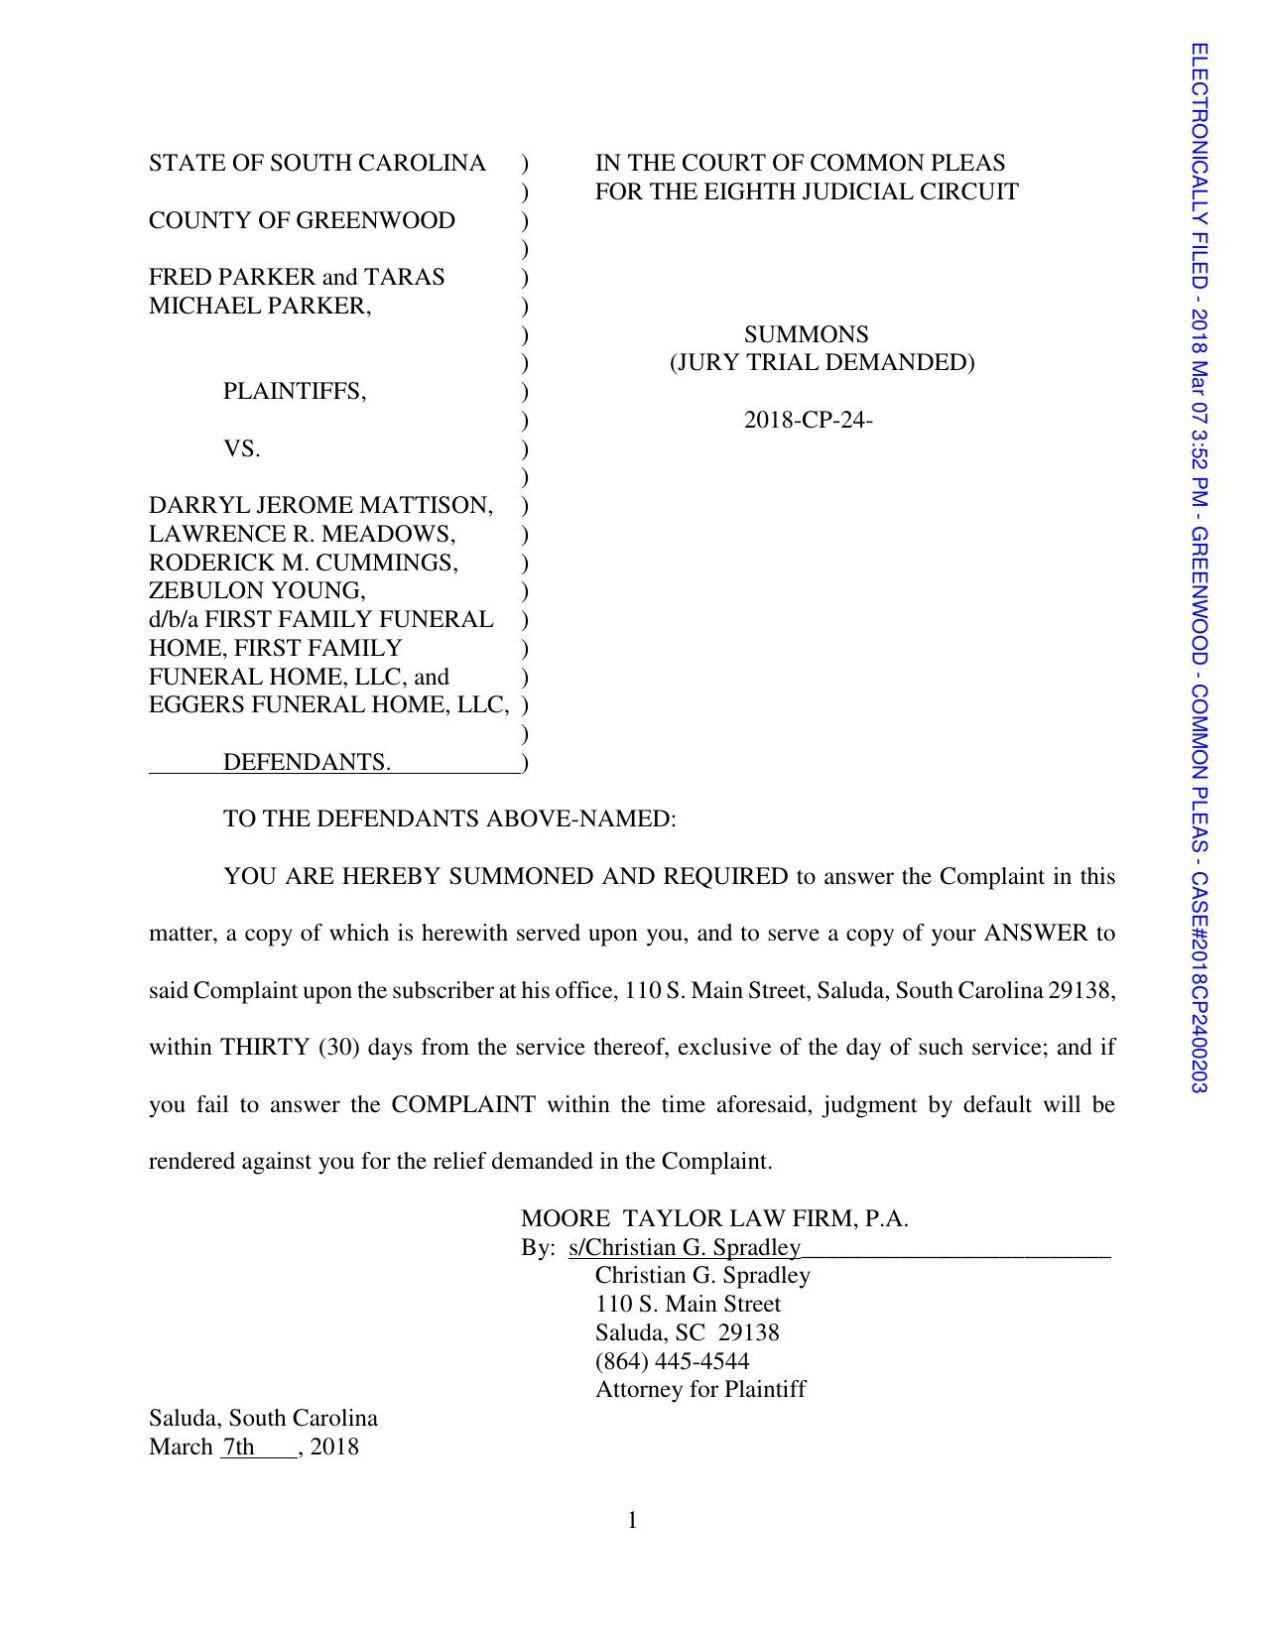 1st Judicial Circuit Radio Wiring Diagram Case 445 In South Carolina Rh Vehiclewiring Today Of Florida